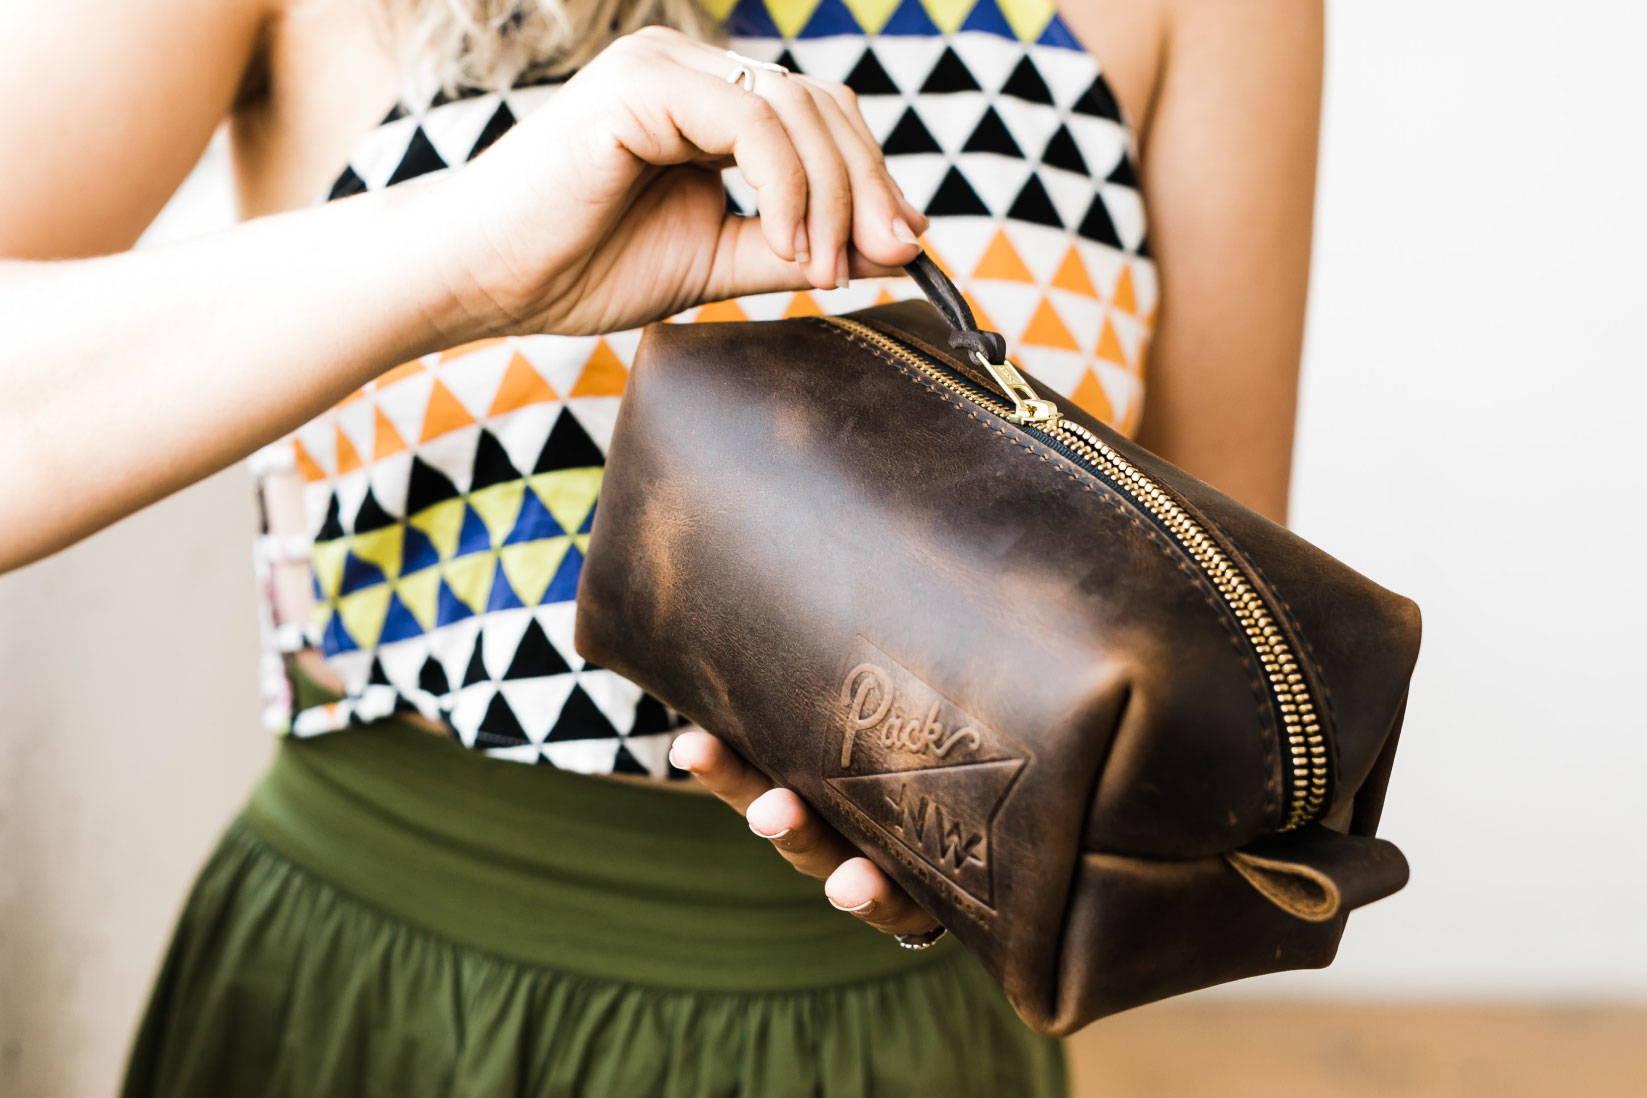 woman unzipping a corporate branded dopp kit